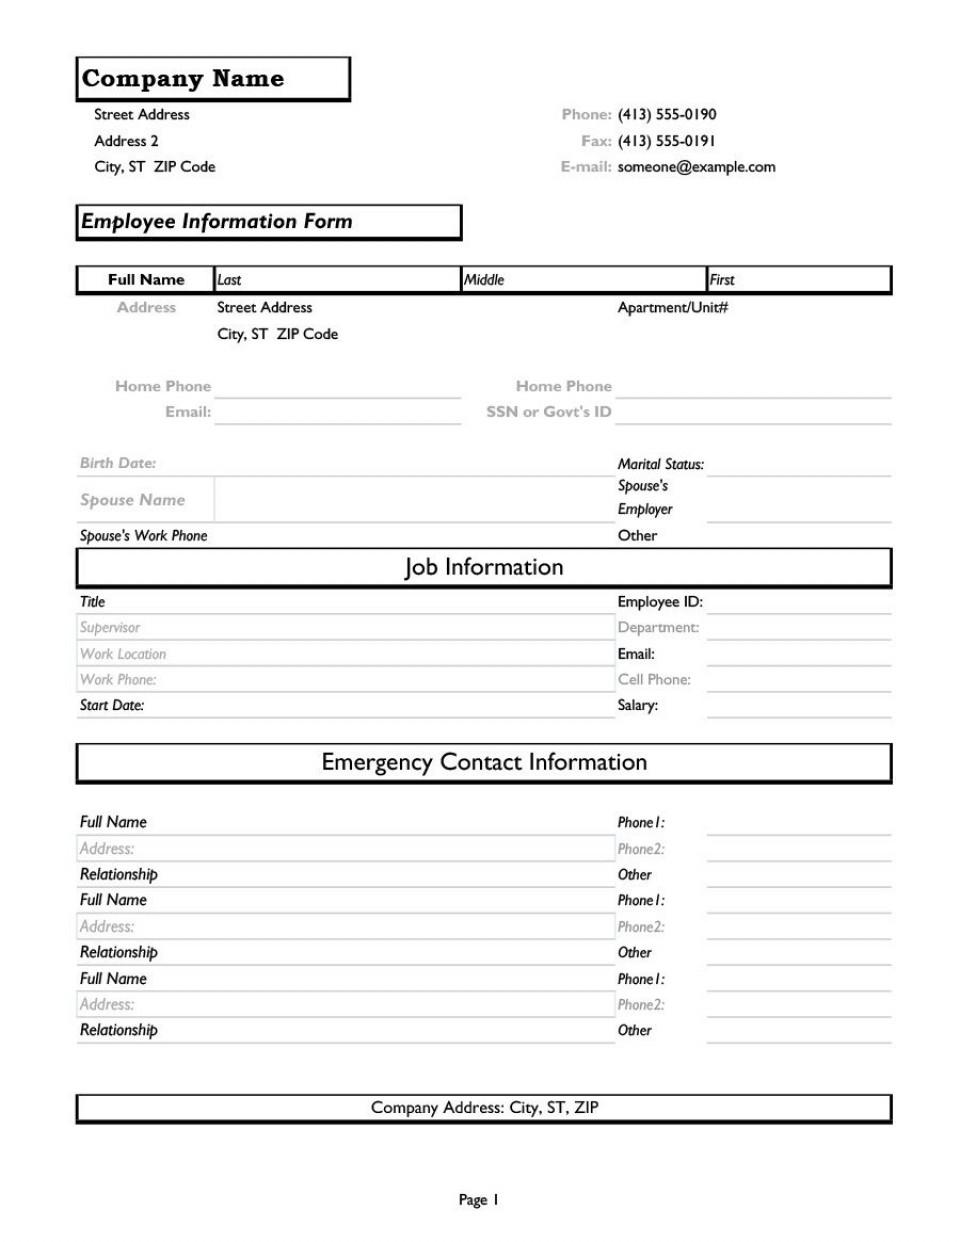 012 Unique Employee Personnel File Template Image  Uk Form Checklist960